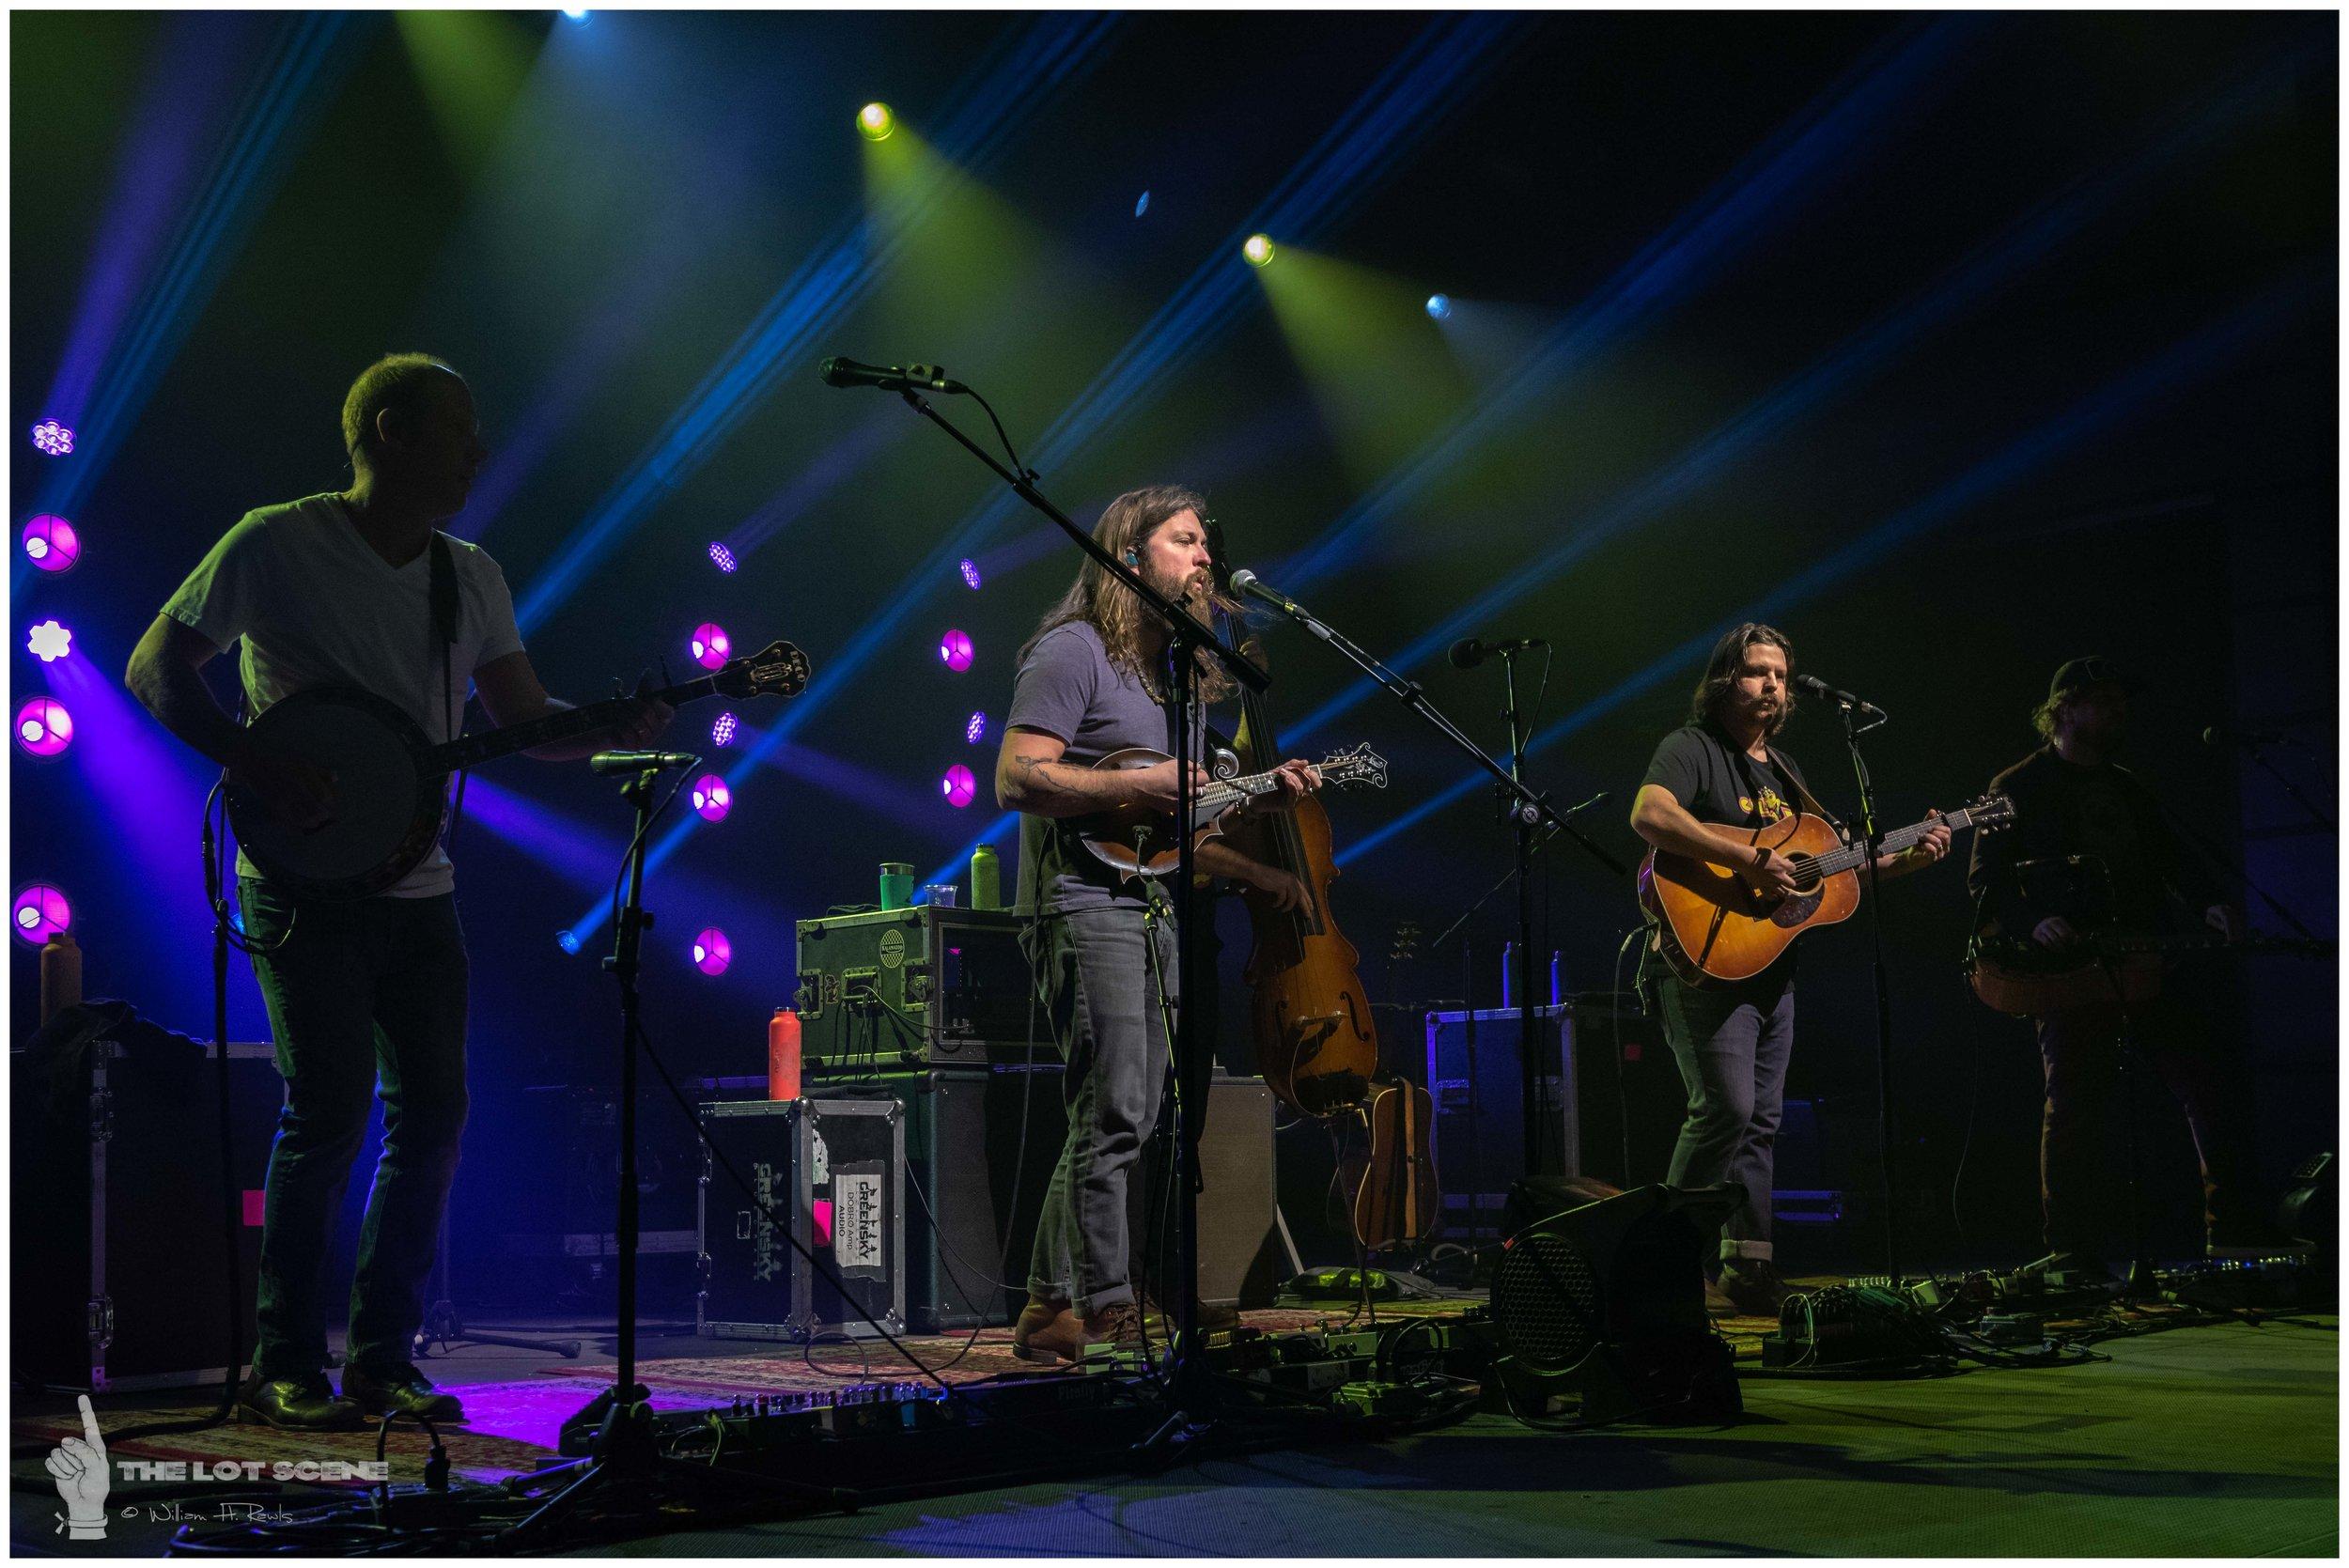 Greensky Bluegrass at The Anthem DC - February 2 2019 - 16.jpg